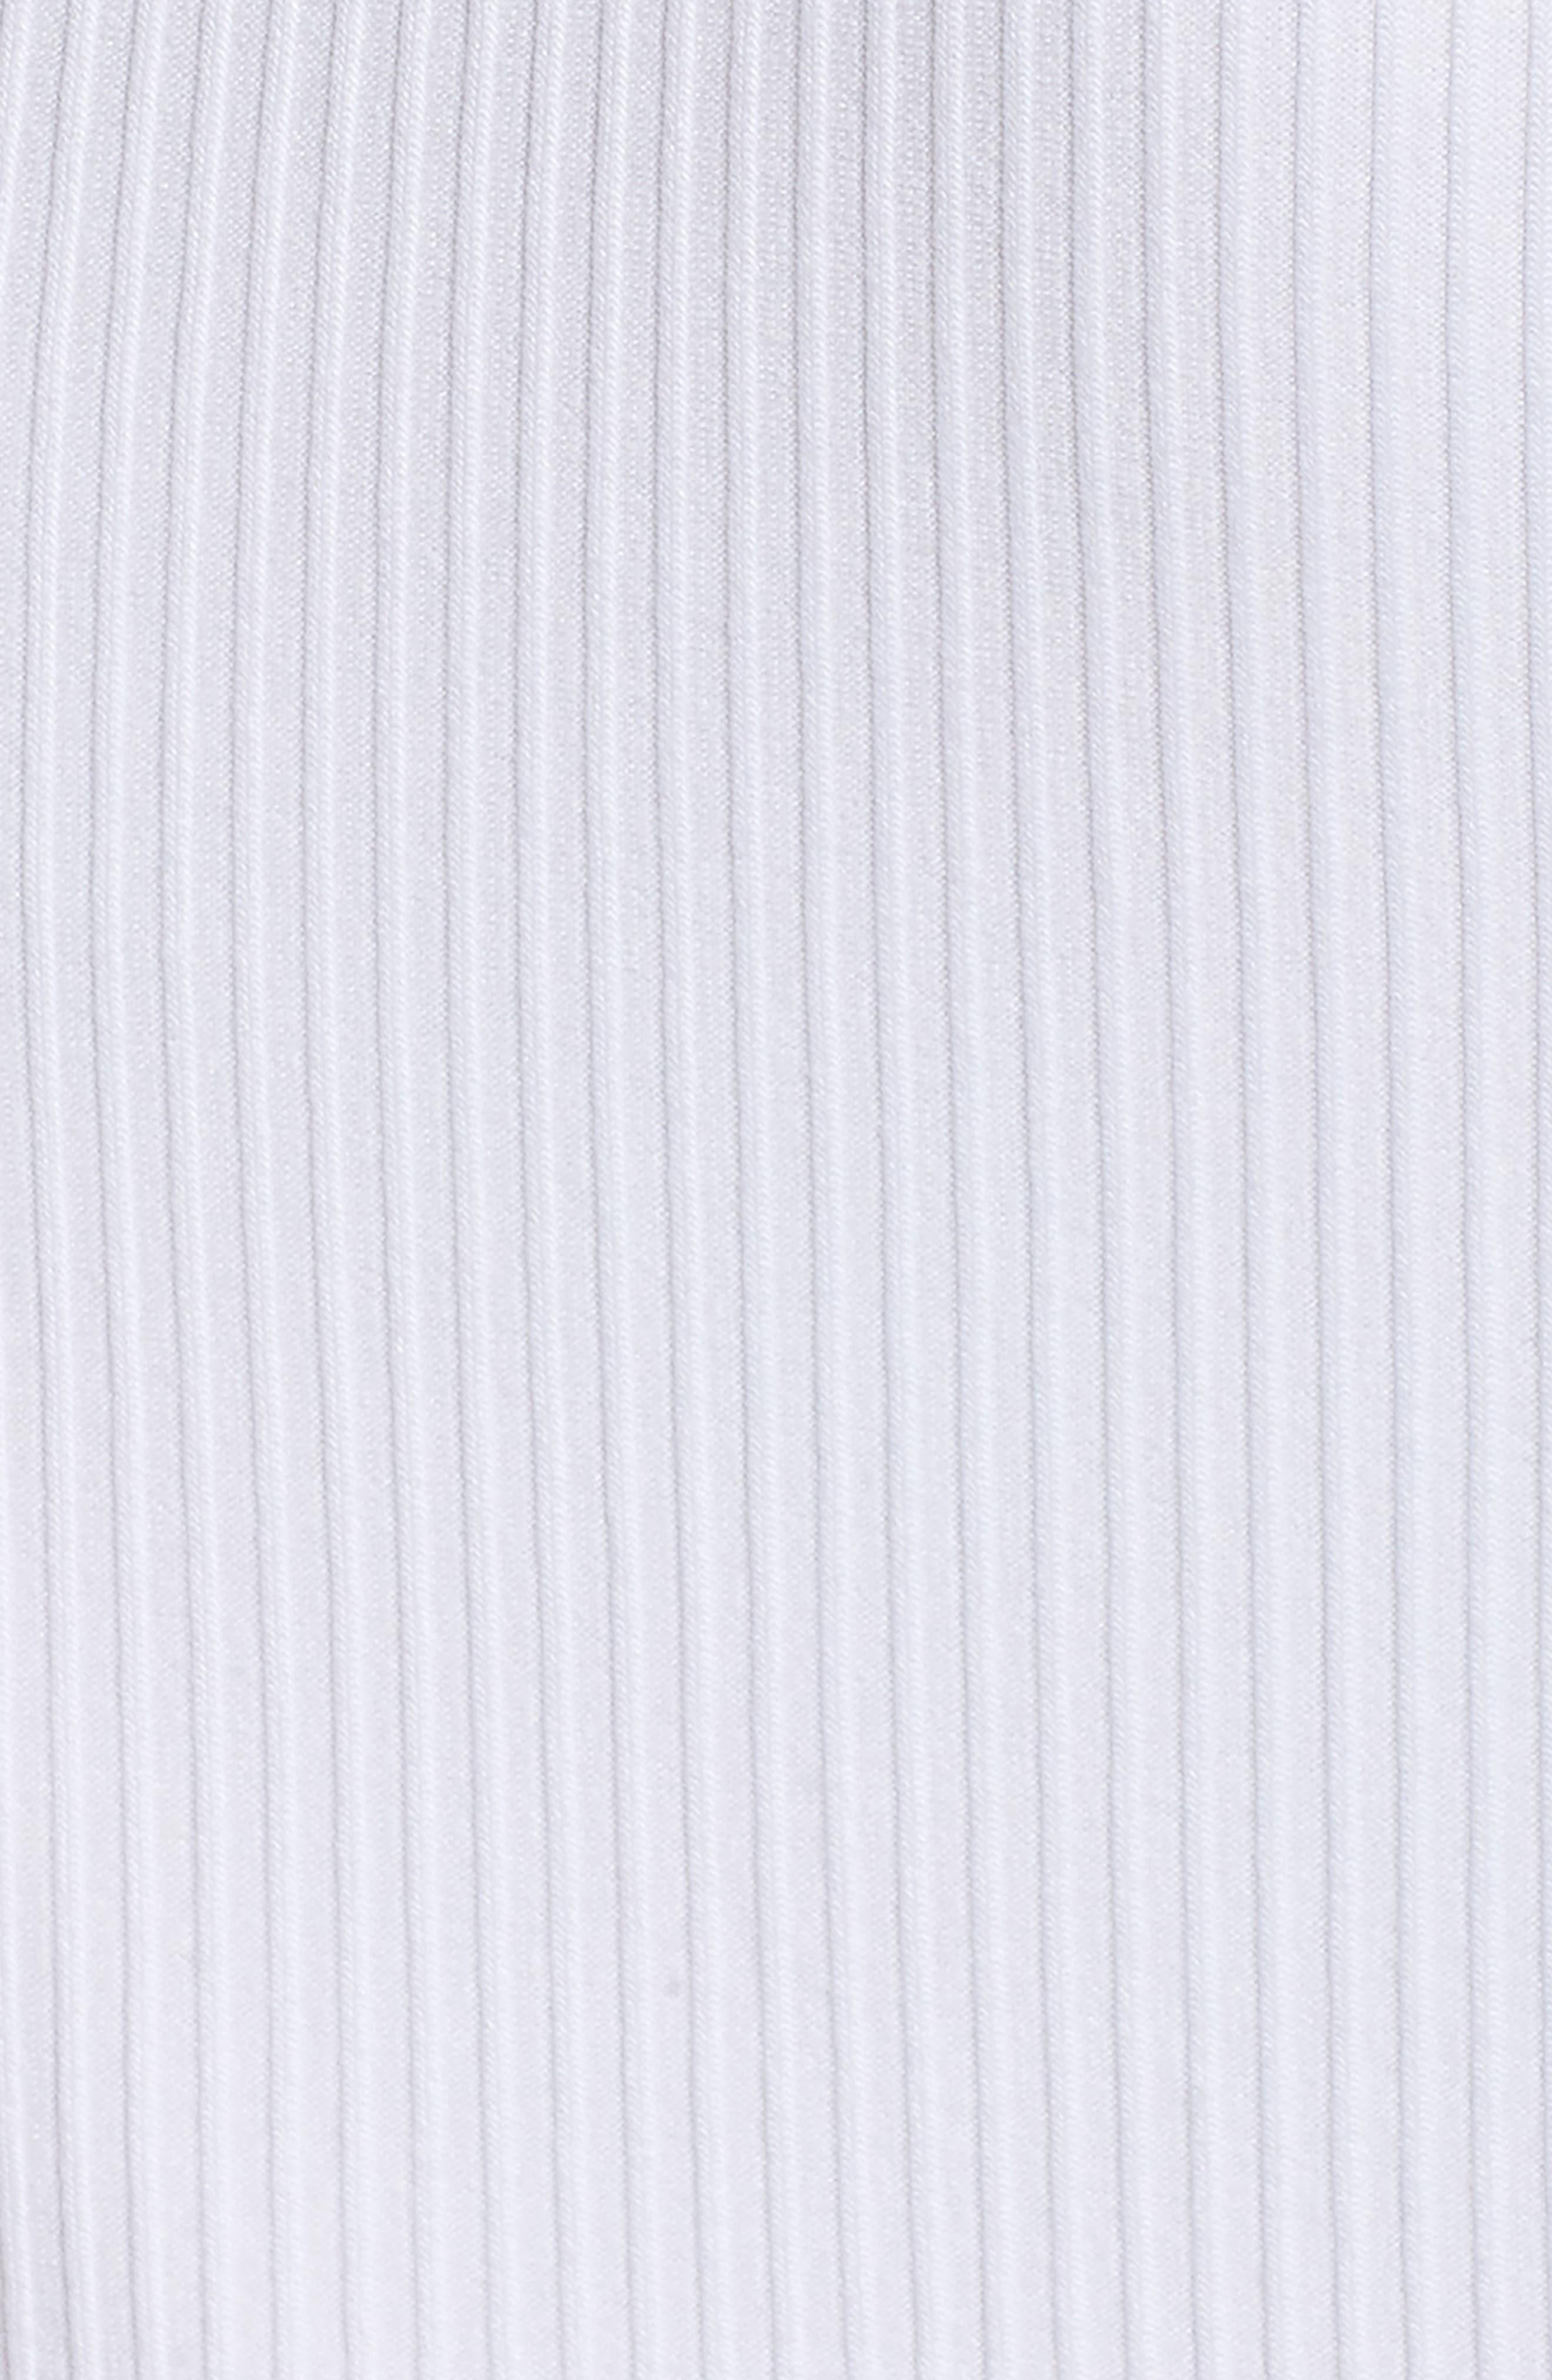 Belted Rib Knit Dress,                             Alternate thumbnail 5, color,